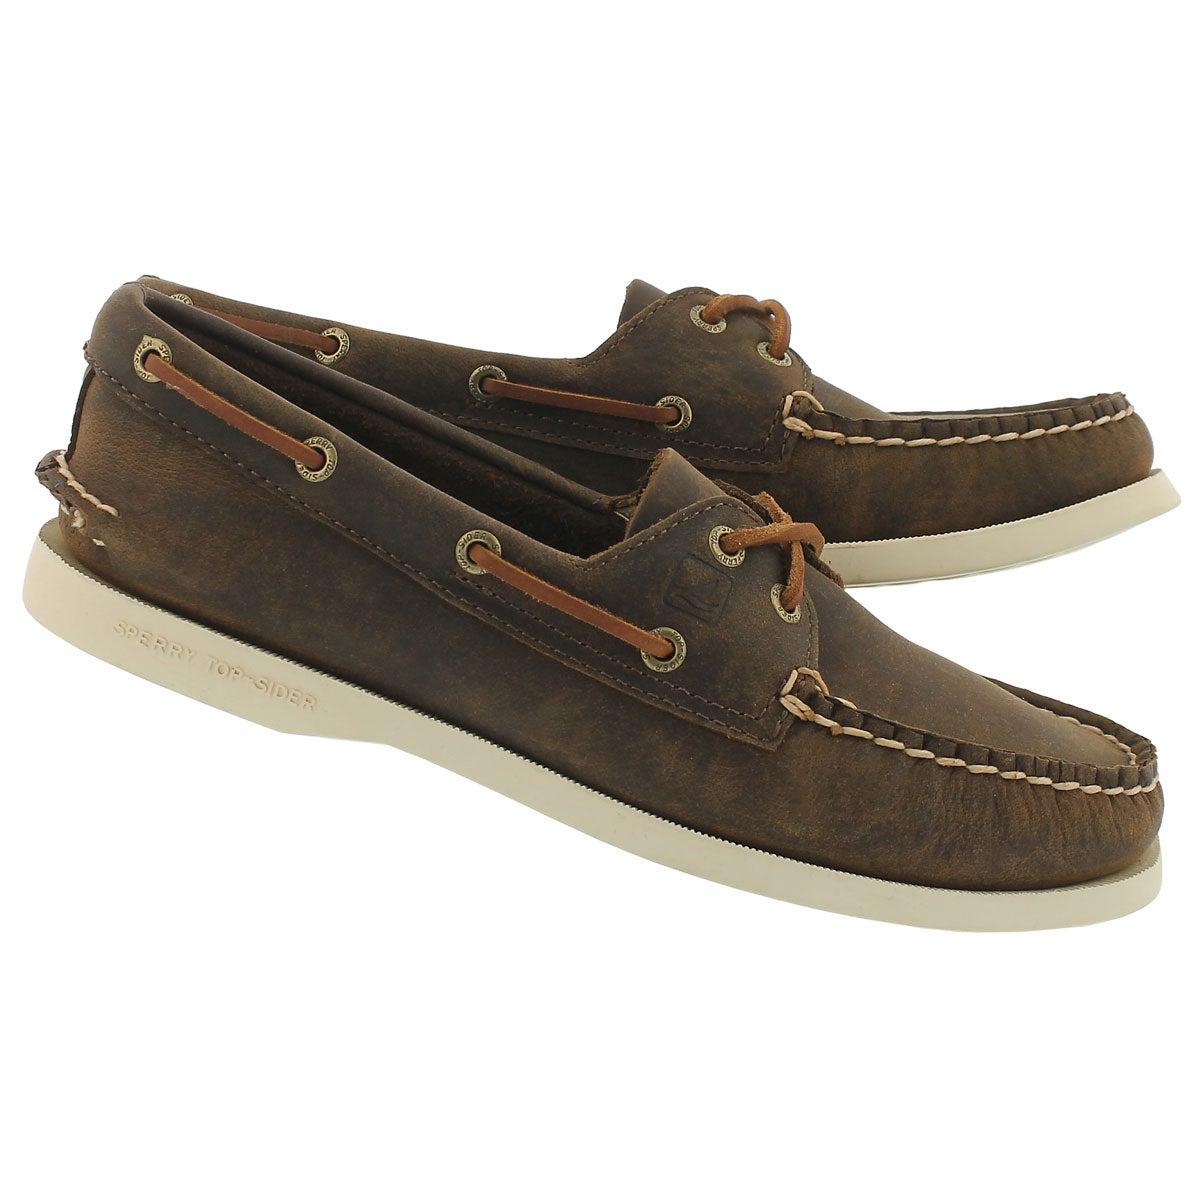 Chauss bateau brun A/O, fem